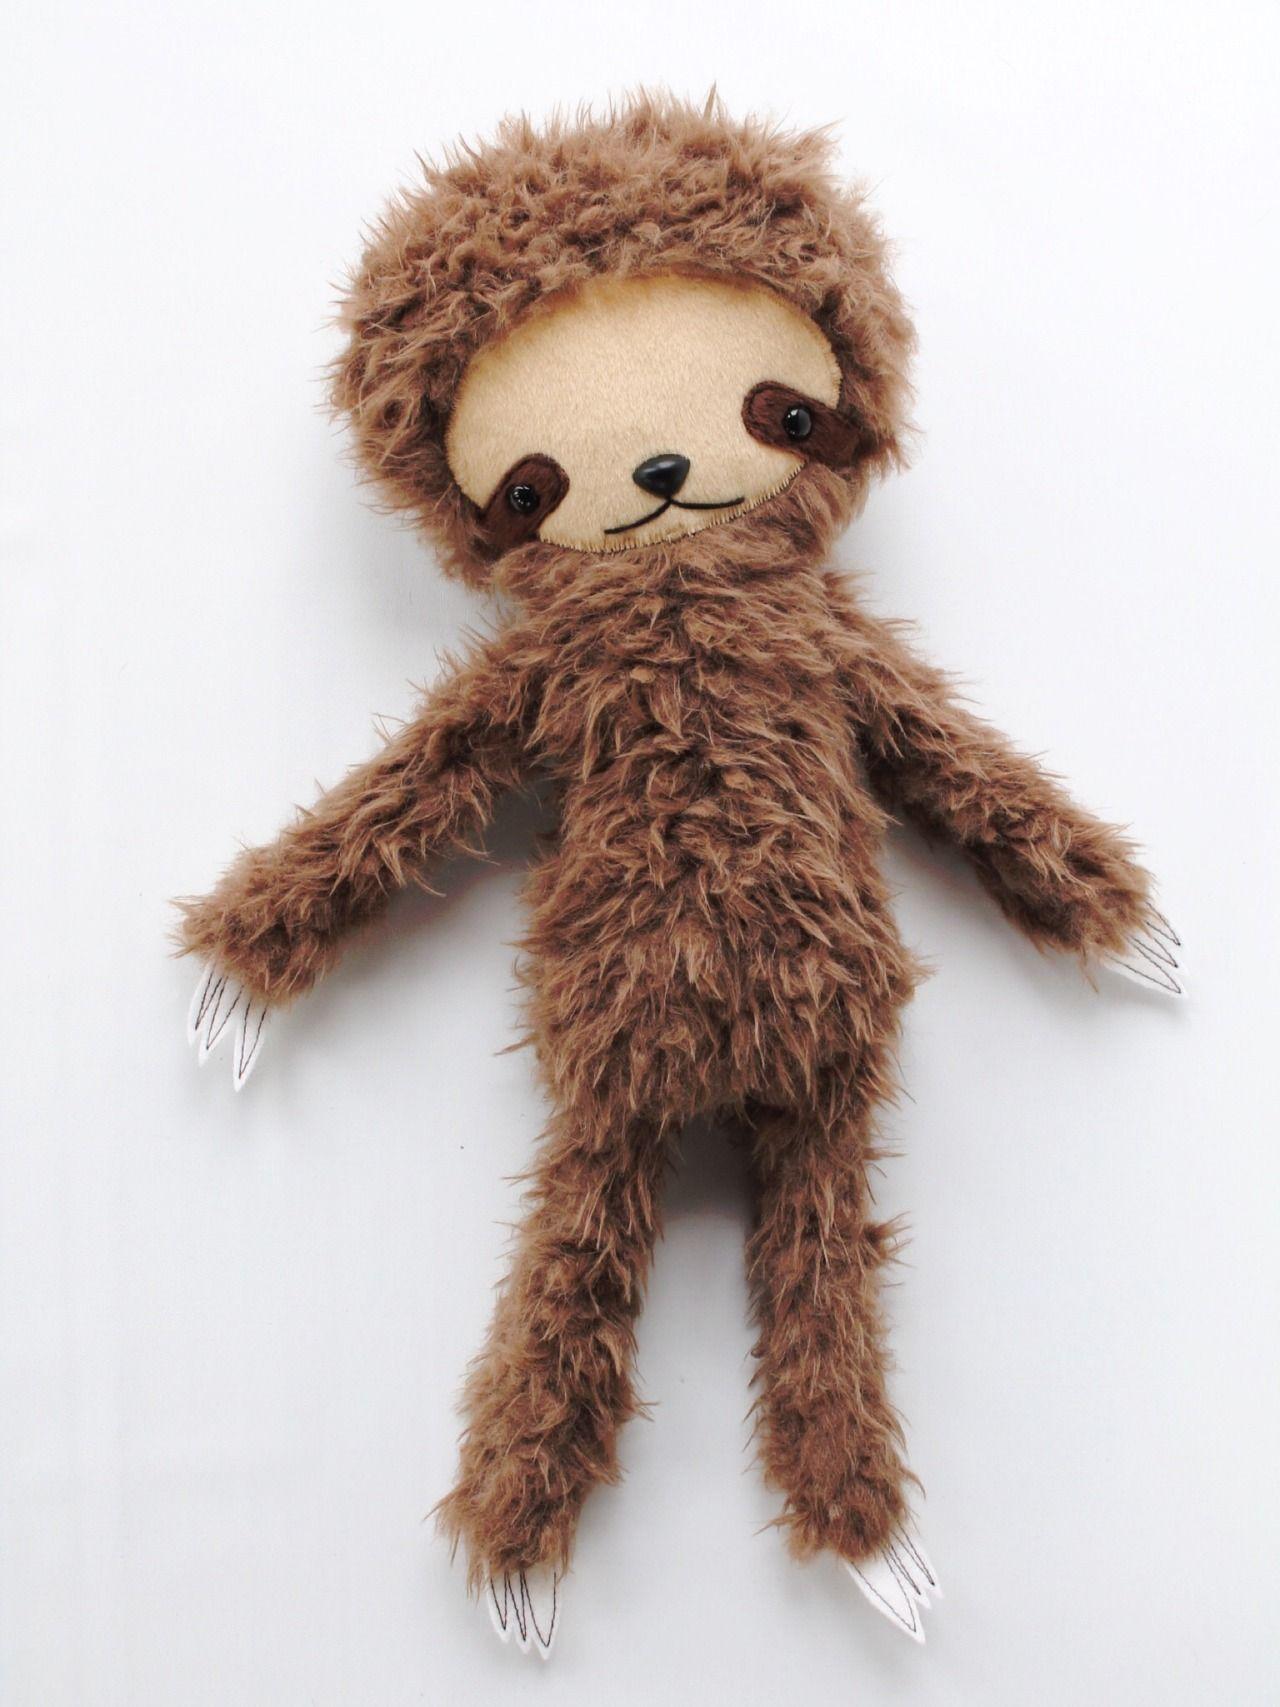 Kawaii Sloth Stuffed Animal Plushie in Brown   Faultier, Puppen und ...